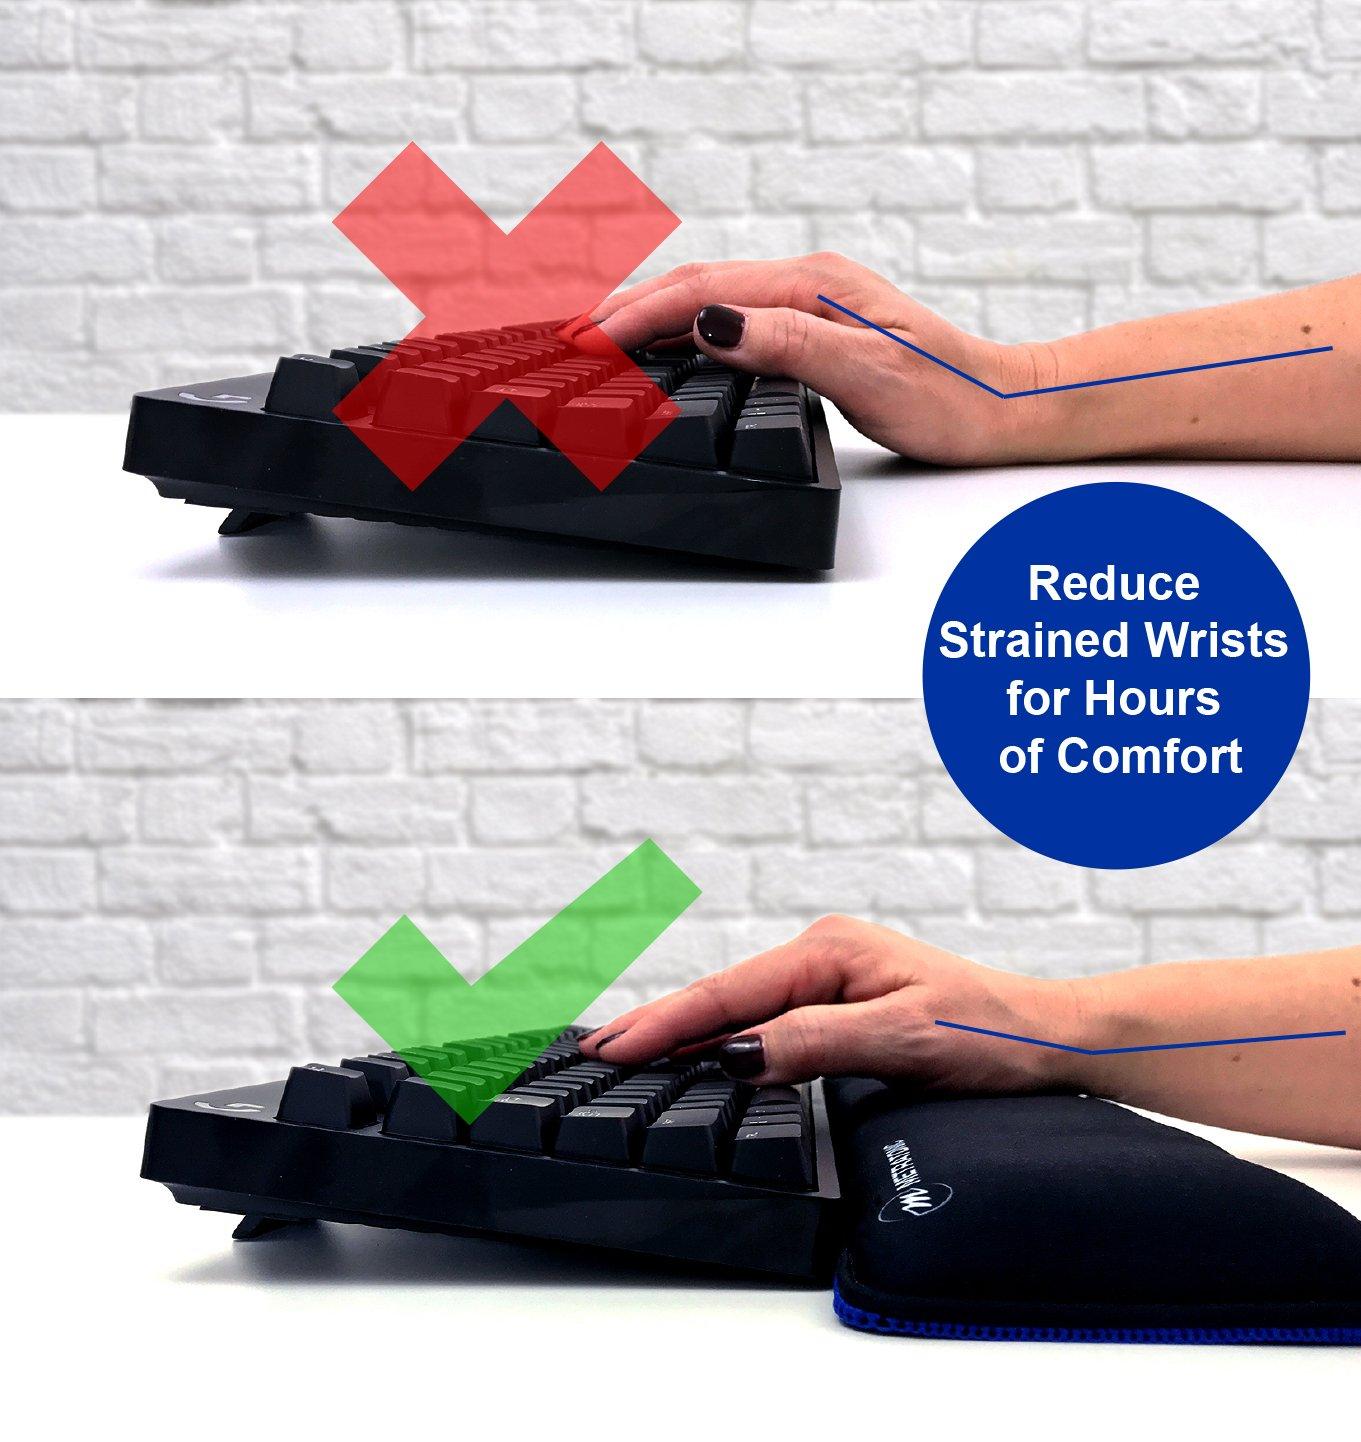 "XL Keyboard Wrist Rest/Wrist Pad, TENKEYLESS 14.5"" Long x 4"" Wide x 1"" Thick Padded Water Resistant, Ergonomic Memory Foam Gel, Anti-Fray Stitched Edges, Anti-Slip Rubber Base, Black | by Metratonic by Metratonic (Image #8)"